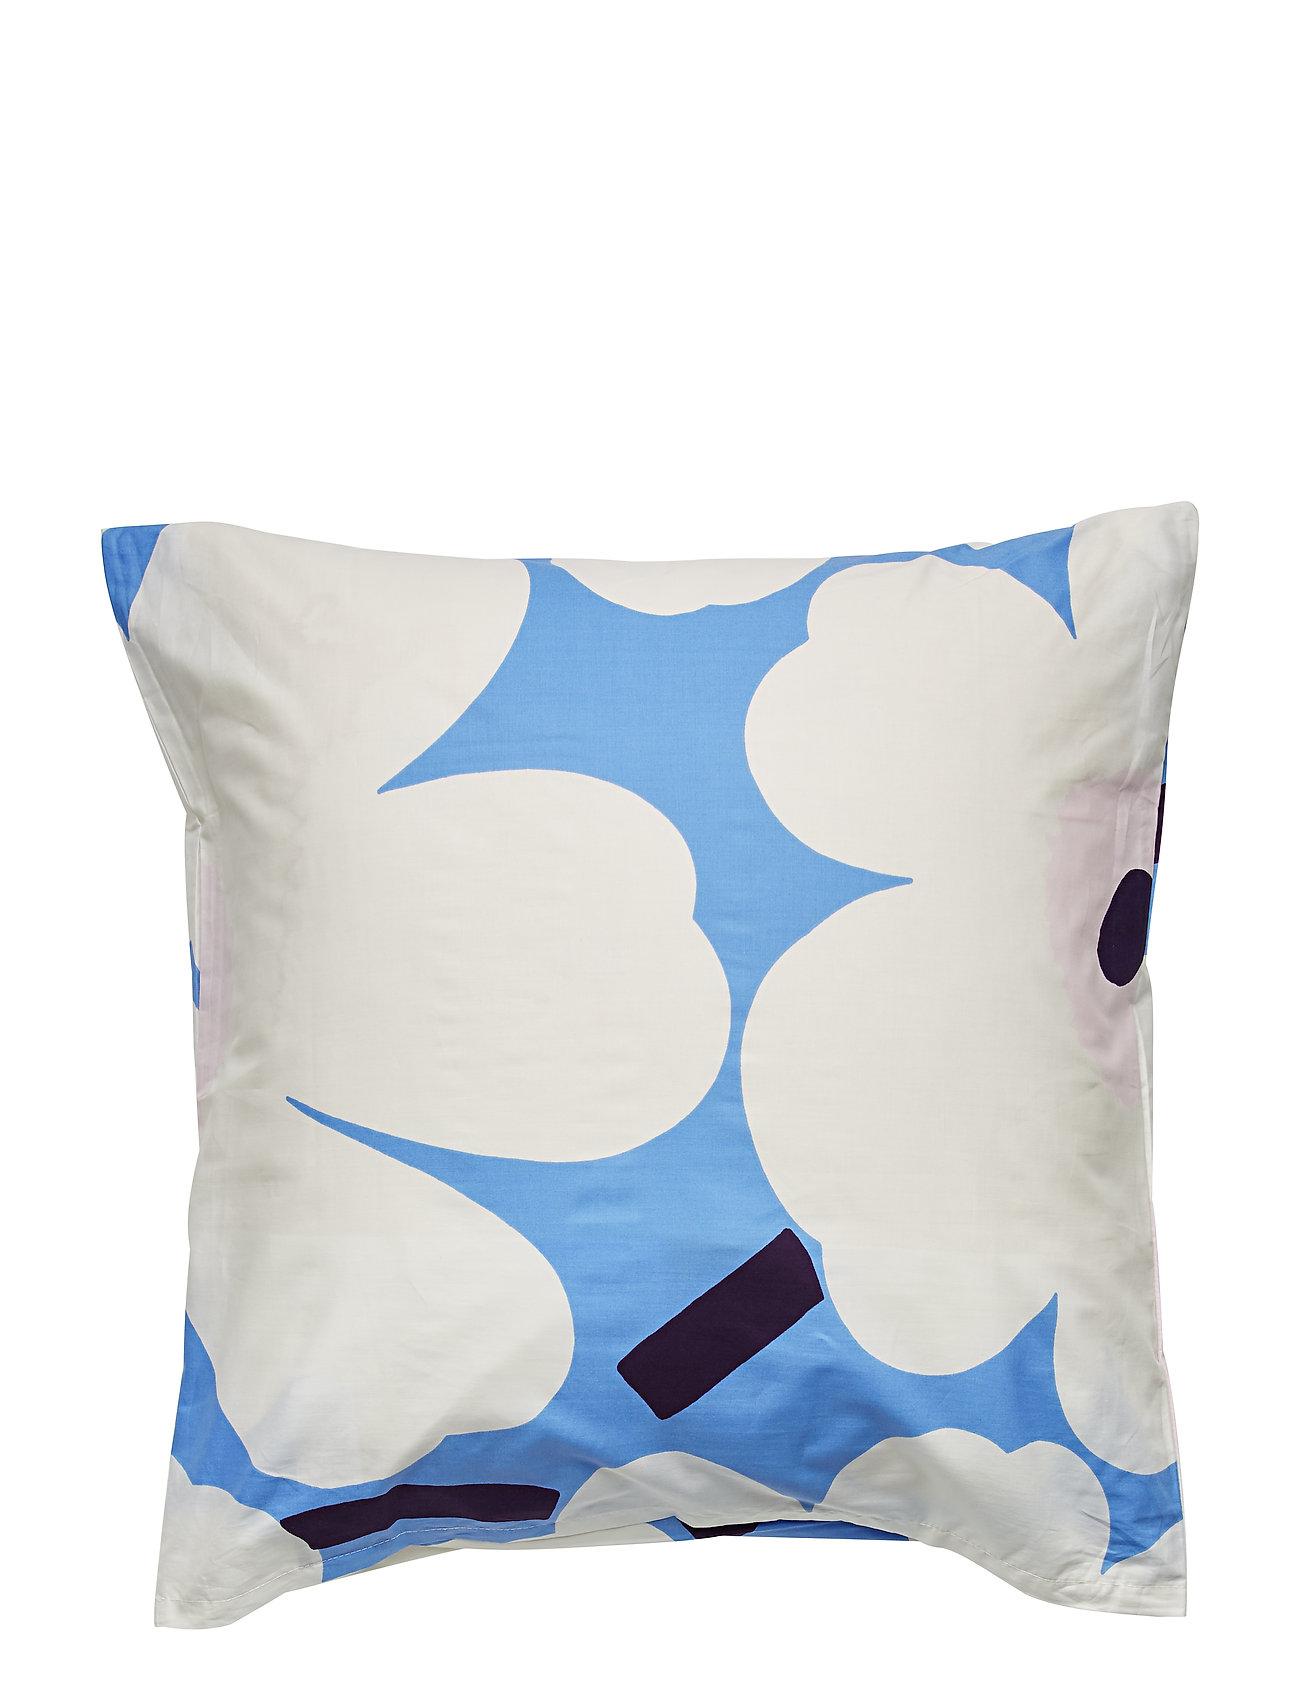 Marimekko Home UNIKKO PILLOW CASE - SKY BLUE, OFF-WHITE, PLUM